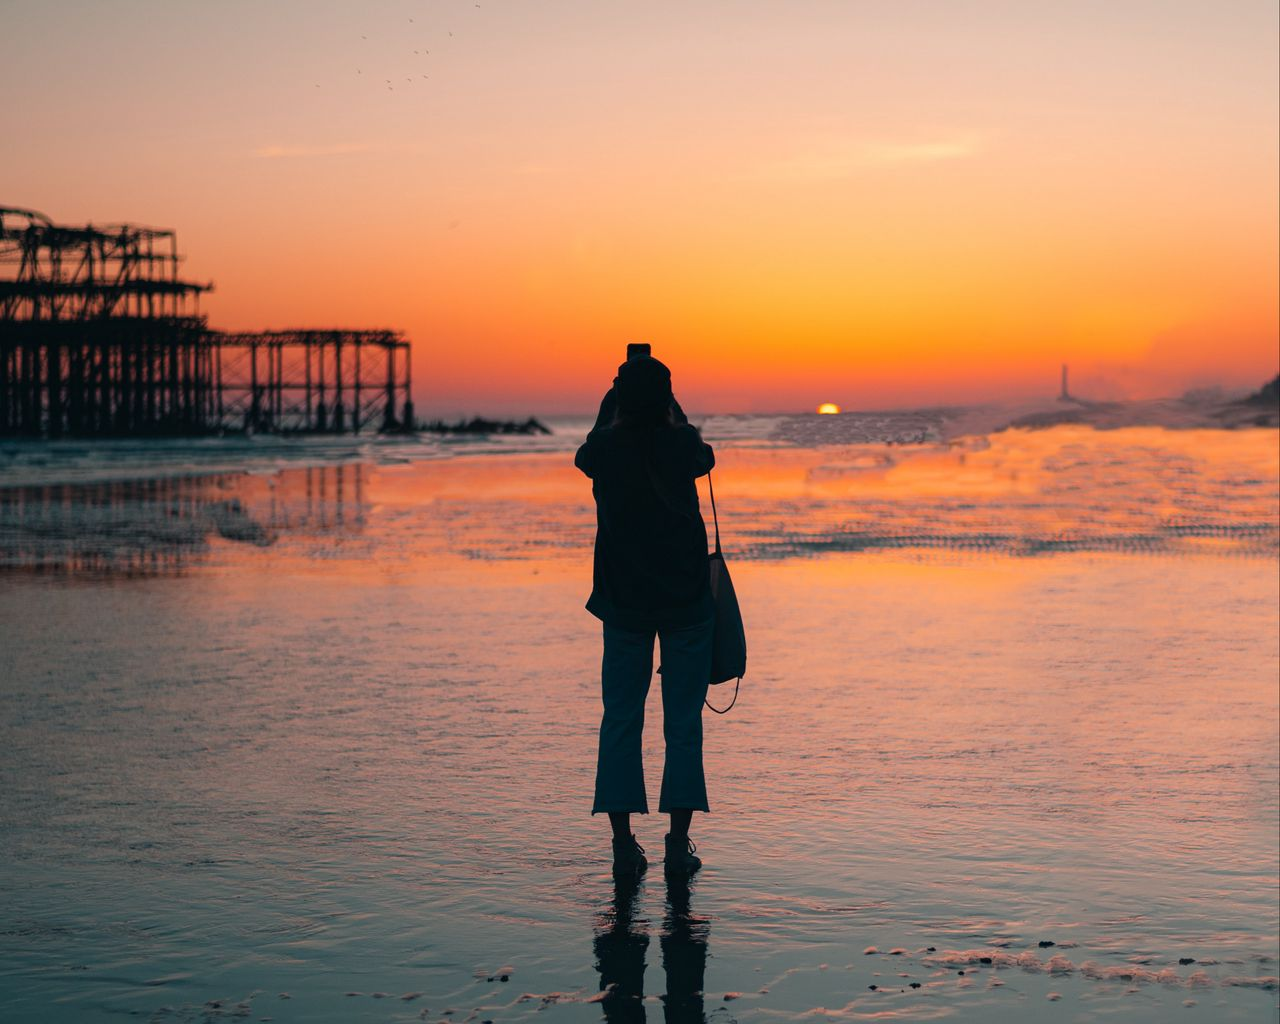 1280x1024 Wallpaper silhouette, alone, beach, sea, sunset, dark